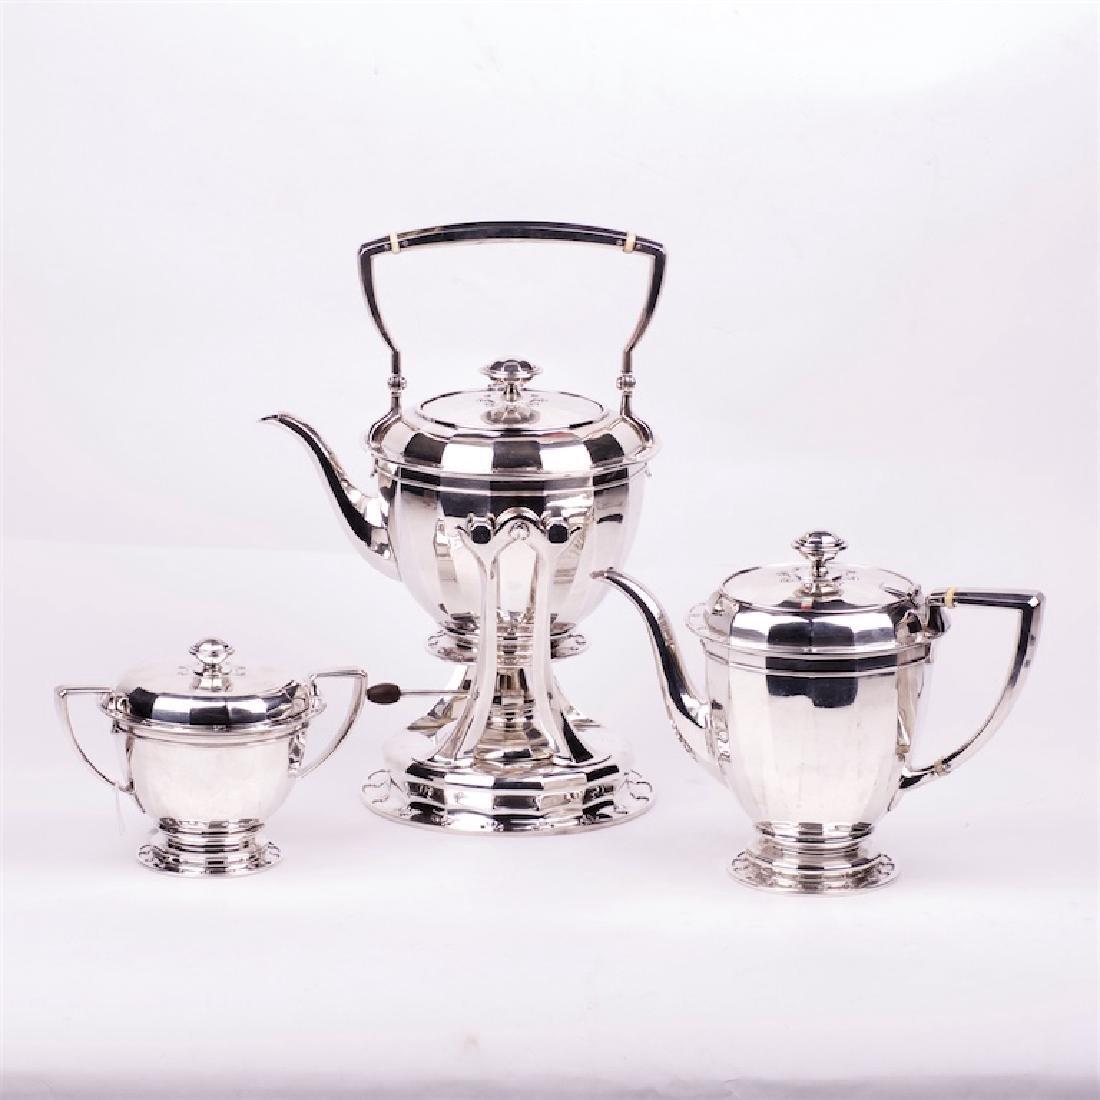 Tiffany & Co silver tea set of 3 pieces